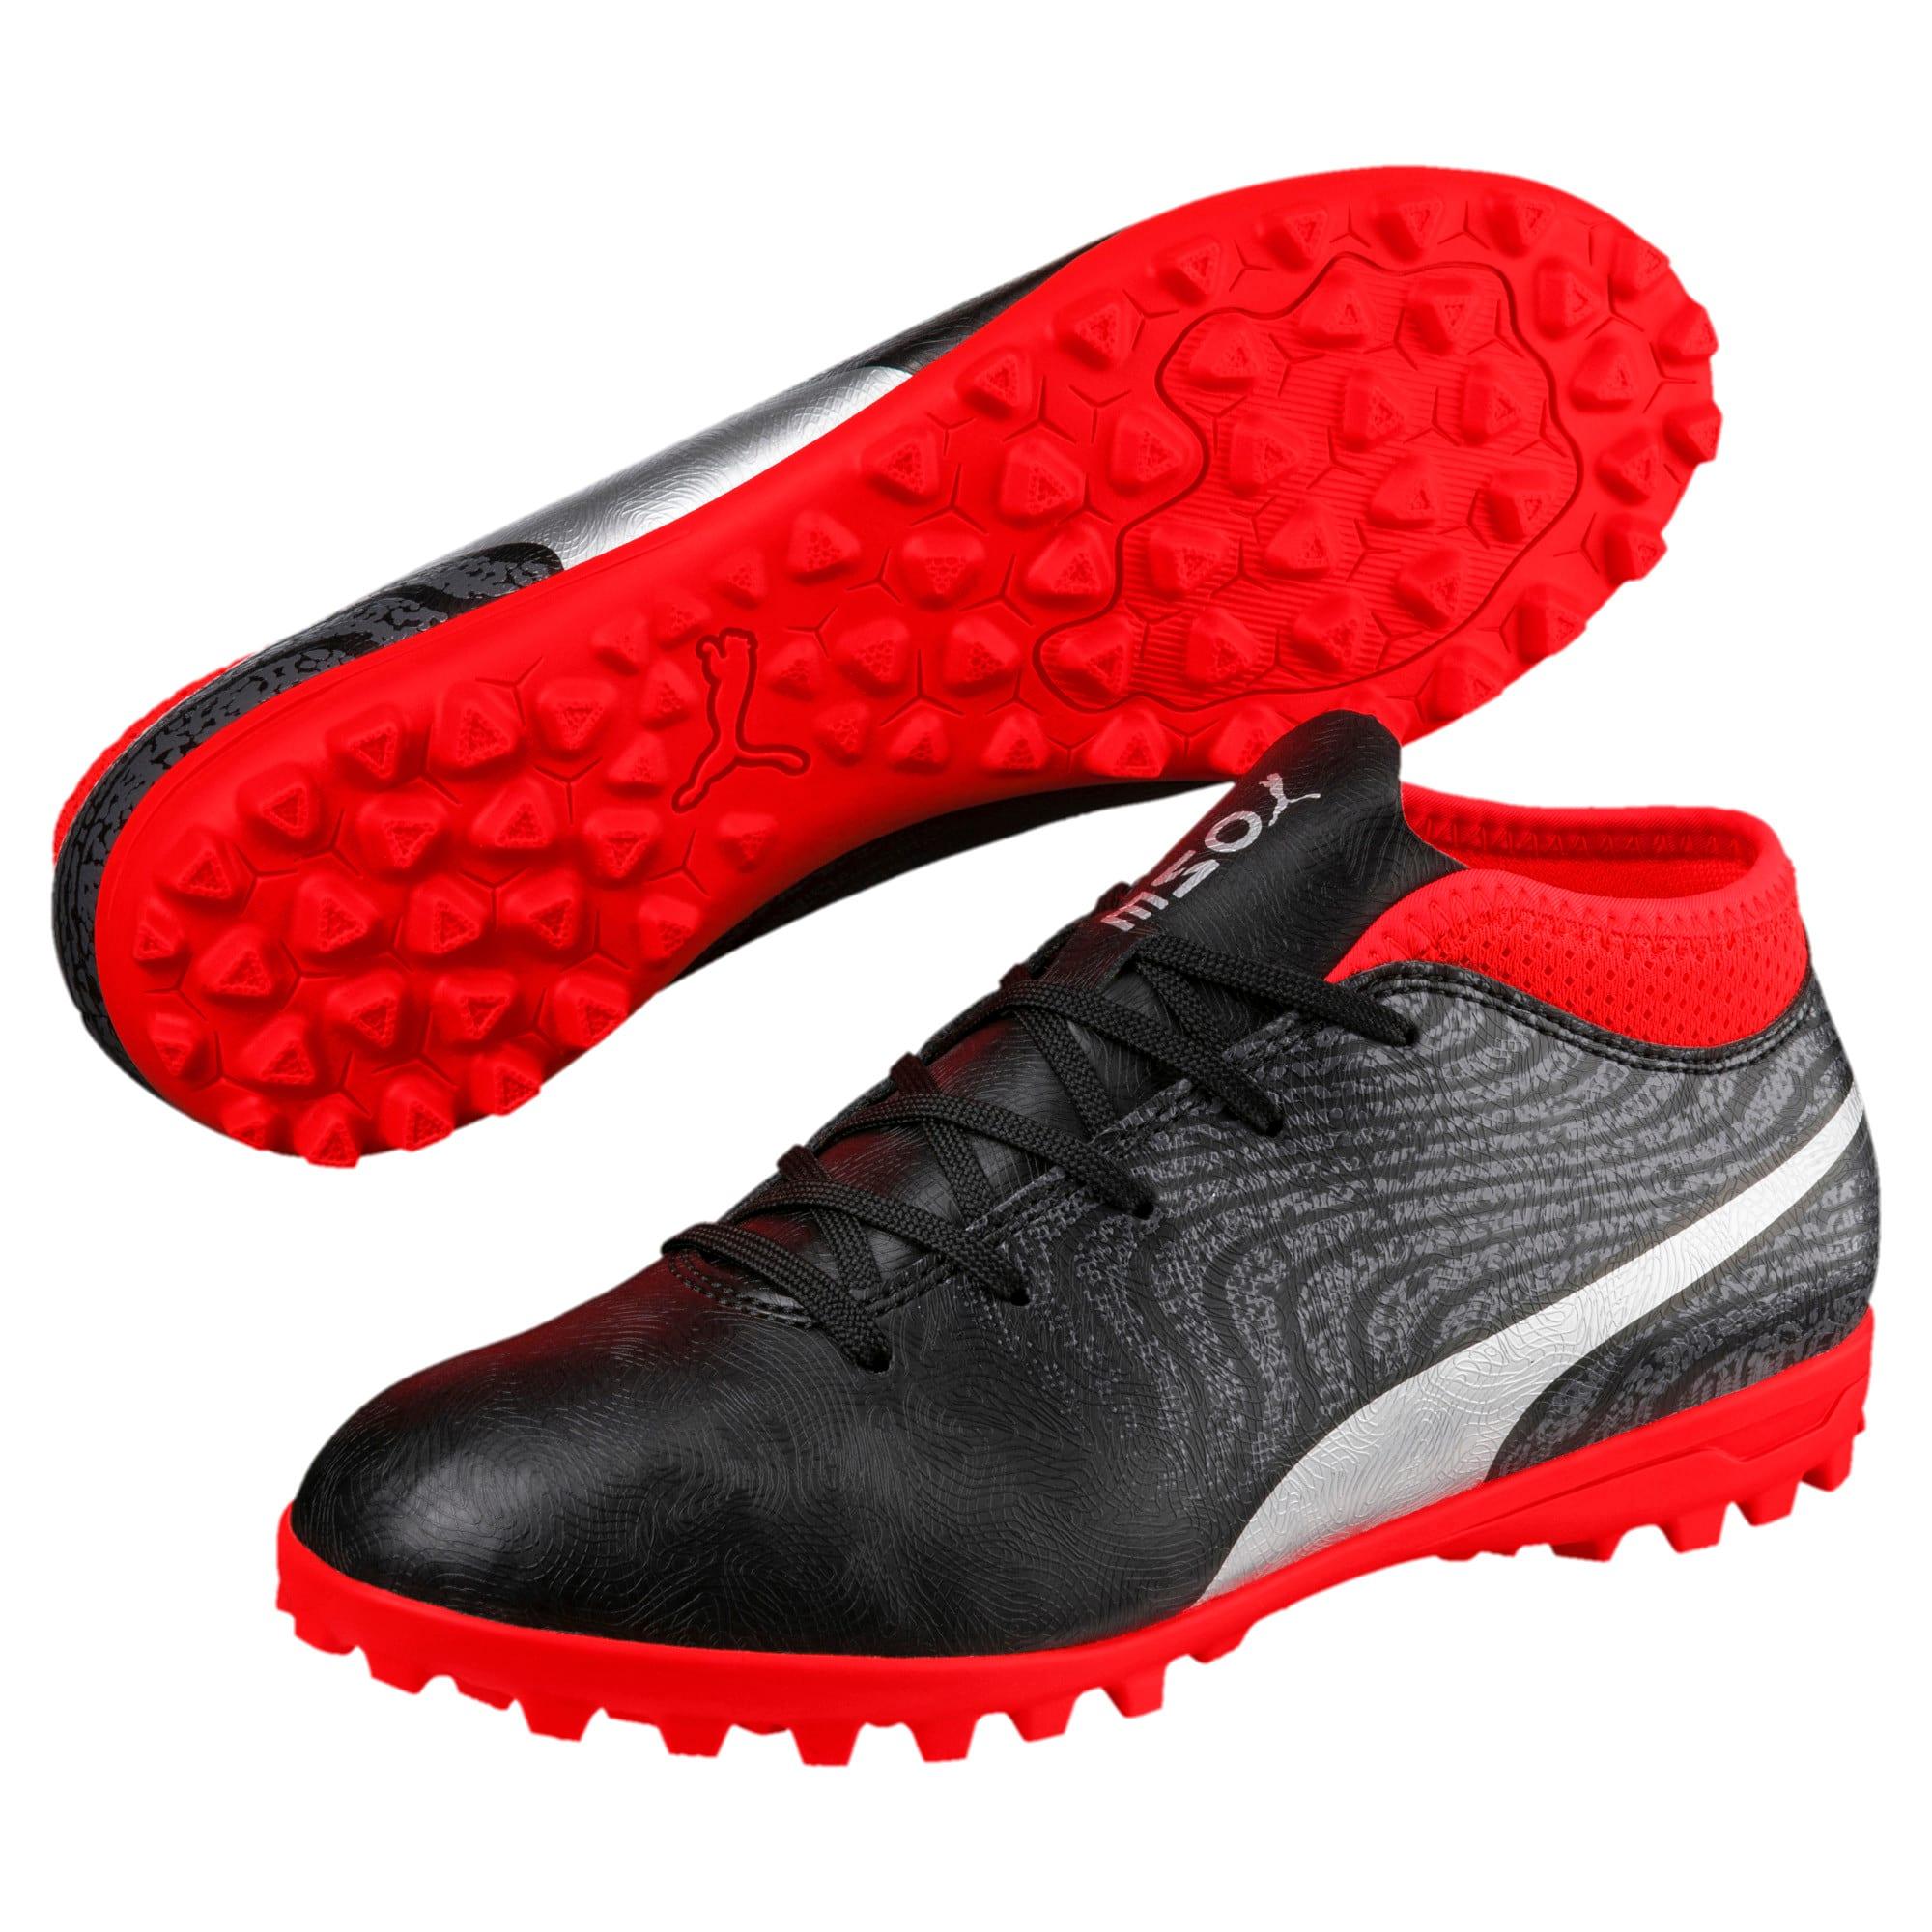 Thumbnail 2 of ONE 18.4 TT Jr Football Boots, Black-Silver-Red, medium-IND